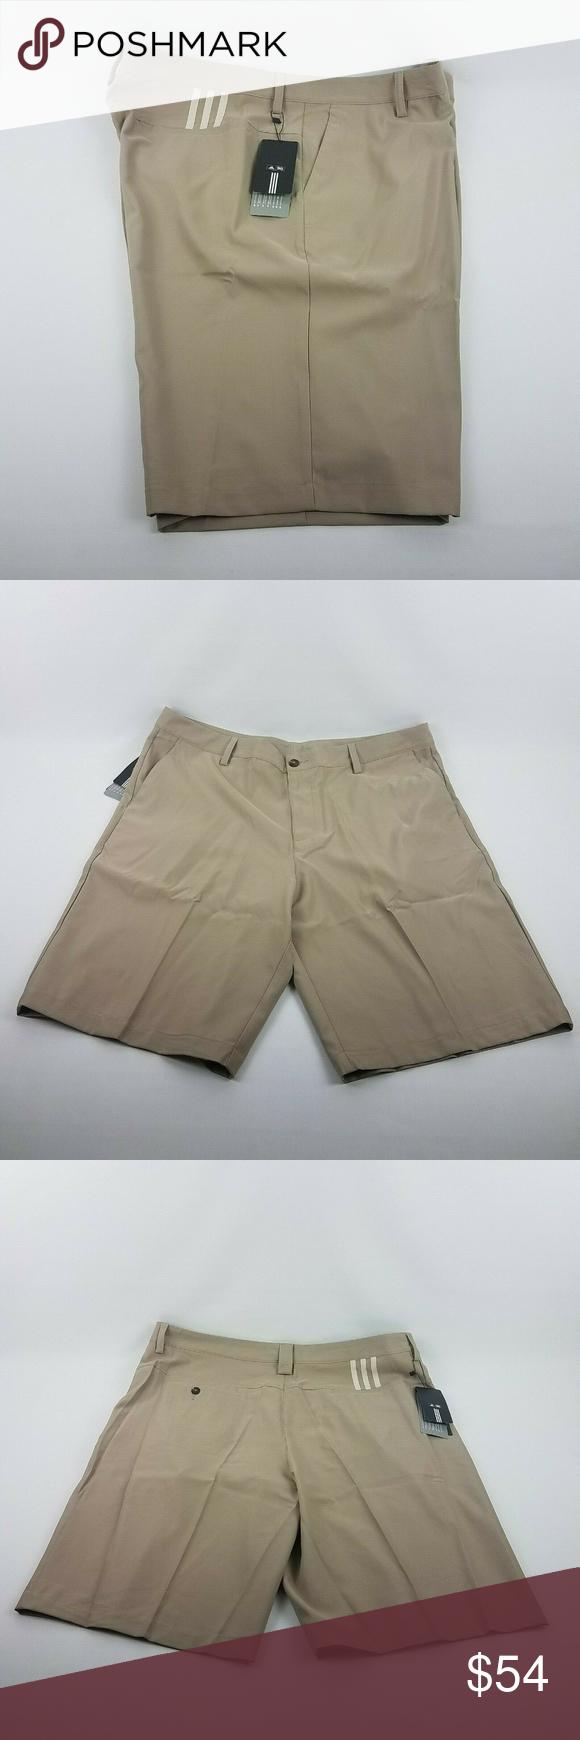 24++ Adidas golf mens climalite 3 stripes shorts info